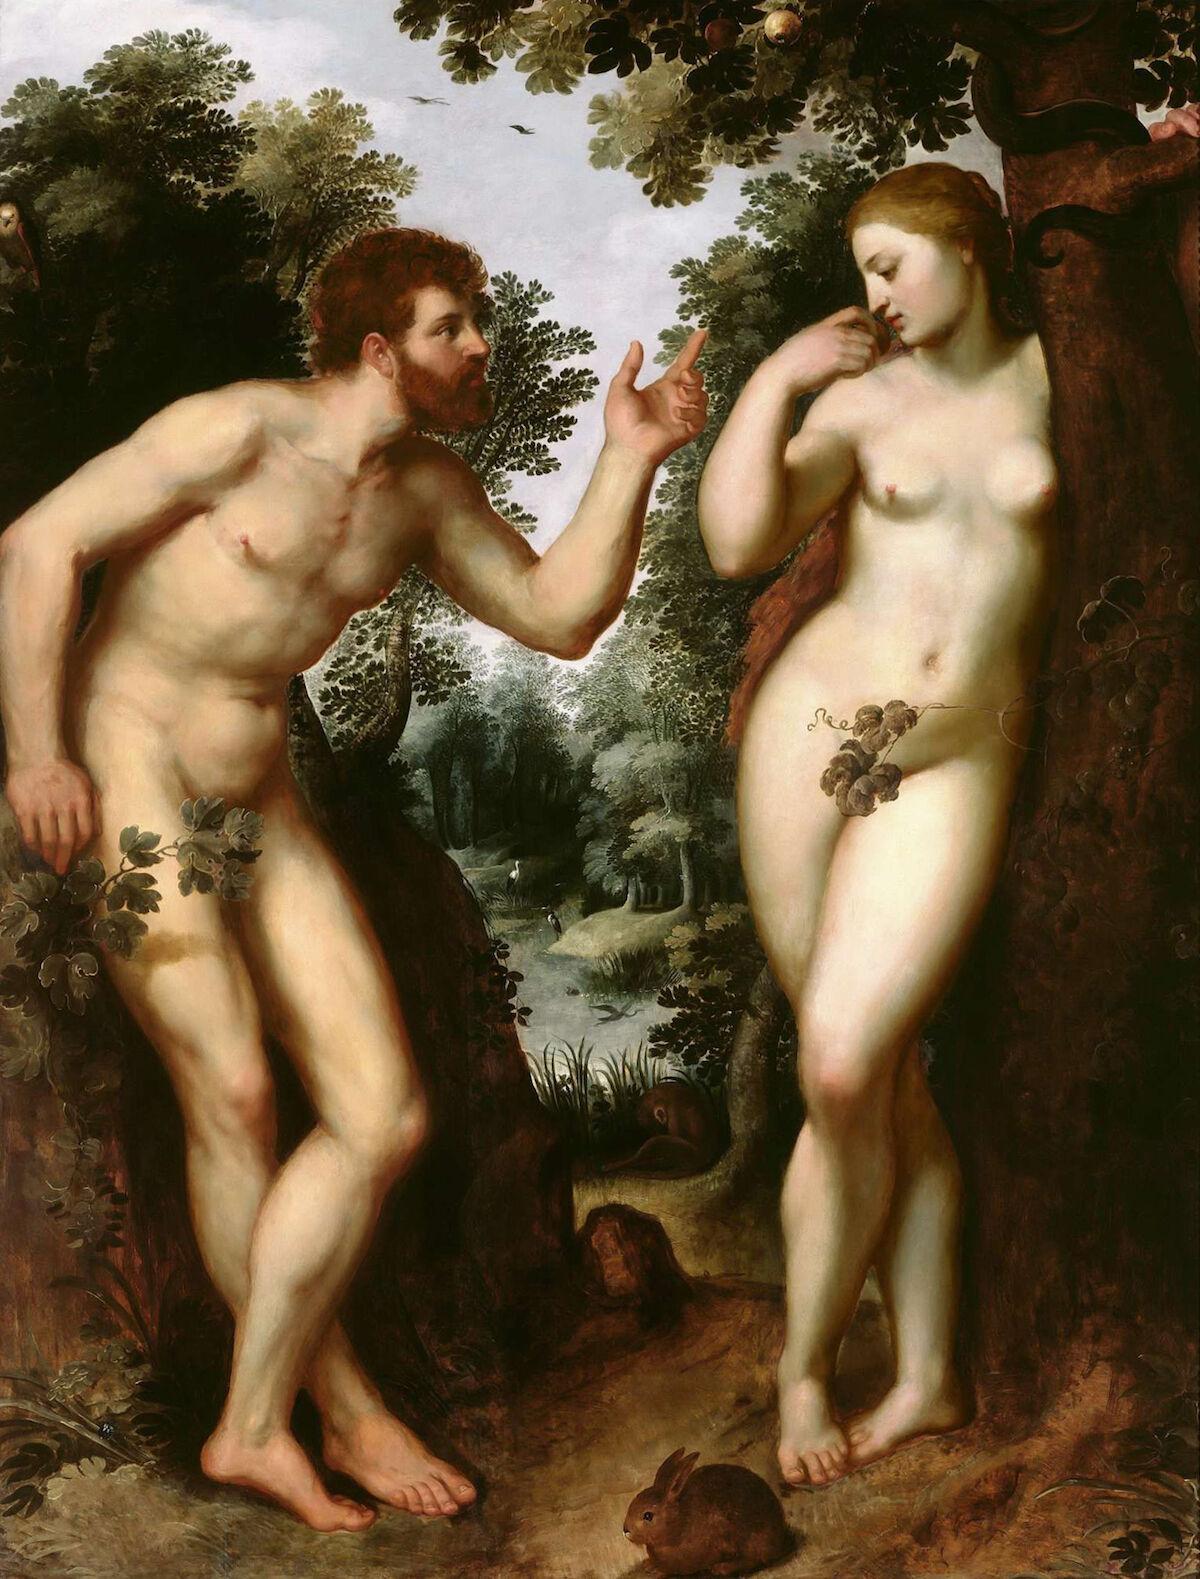 Peter Paul Rubens, Adam and Eve (between 1597–1600), 182.5 cm (71.8 in) by 140.7 cm (55.3 in). Courtesy Rubens House, Antwerp